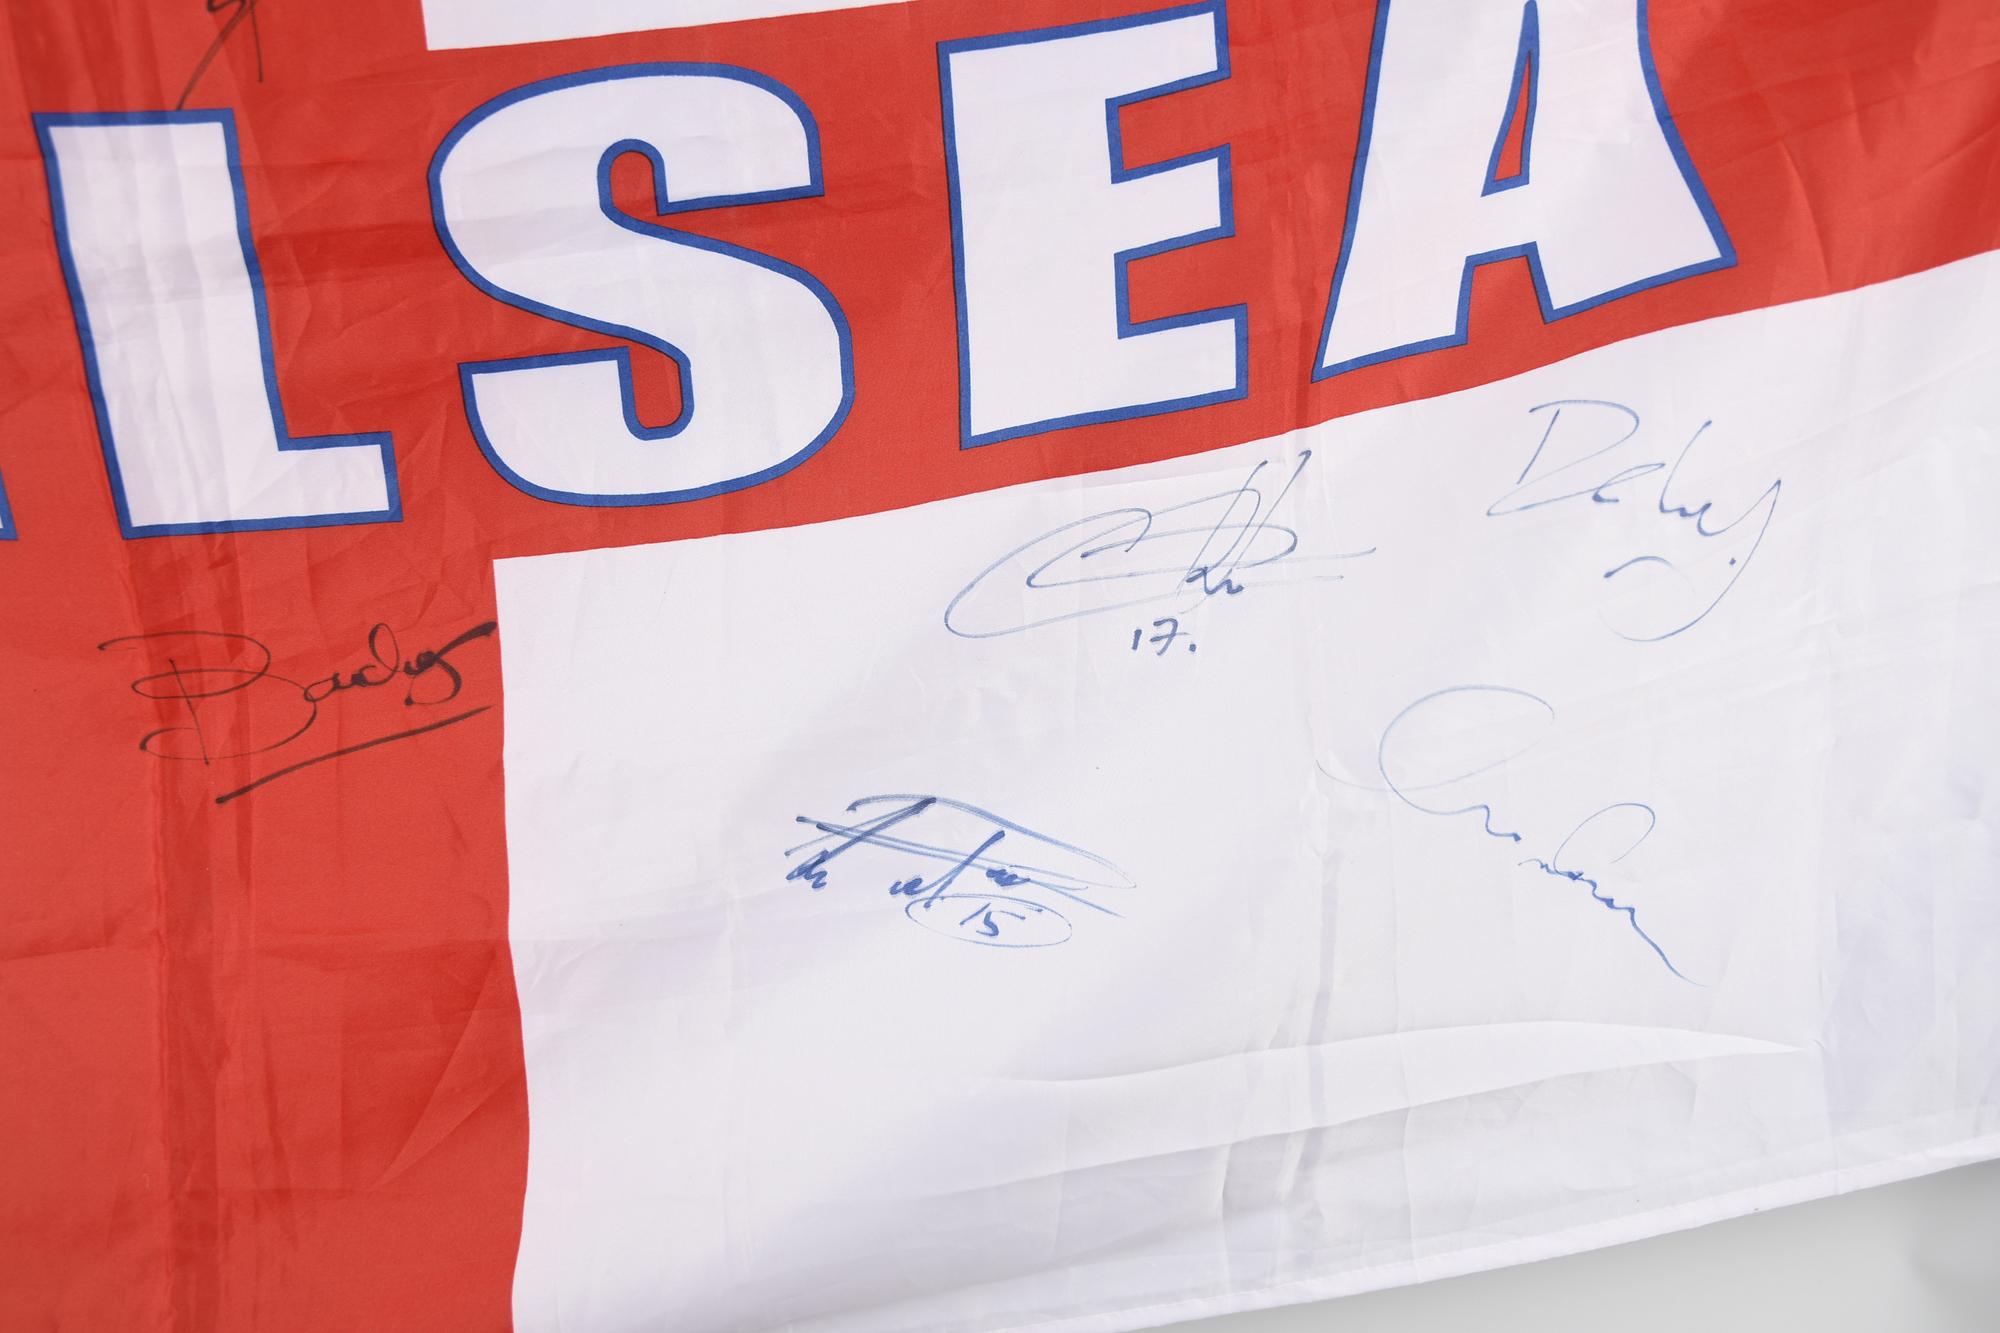 CHELSEA STARS & SIGNED FLAG Original Signature - Image 5 of 11